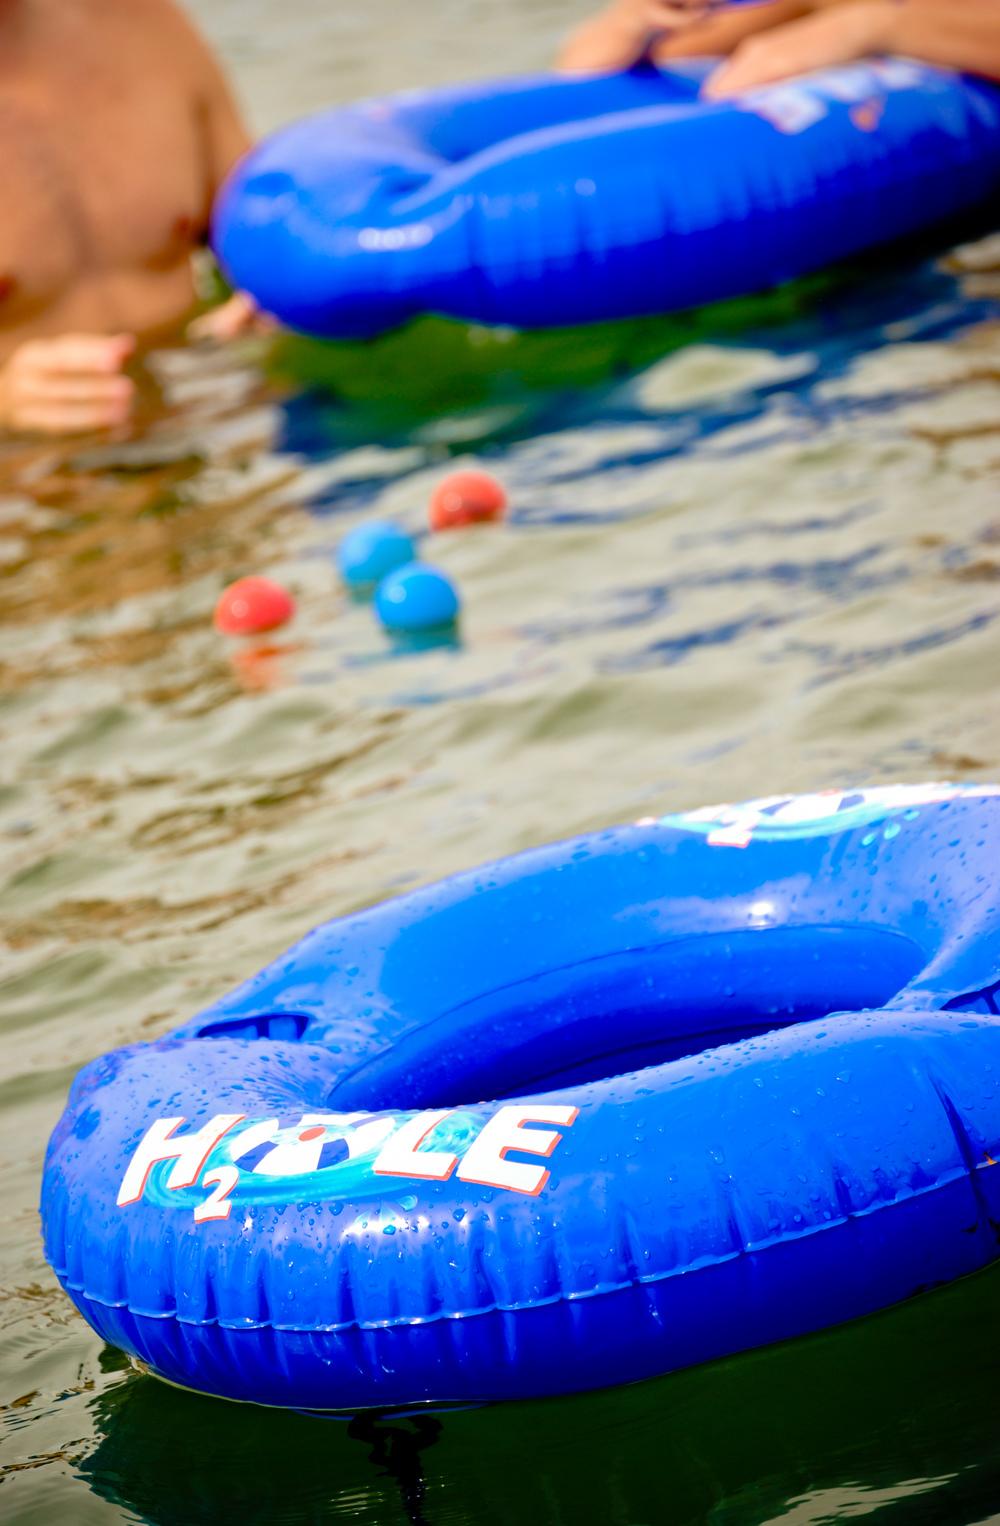 Cornholeonwater's H2ole - Lake Version